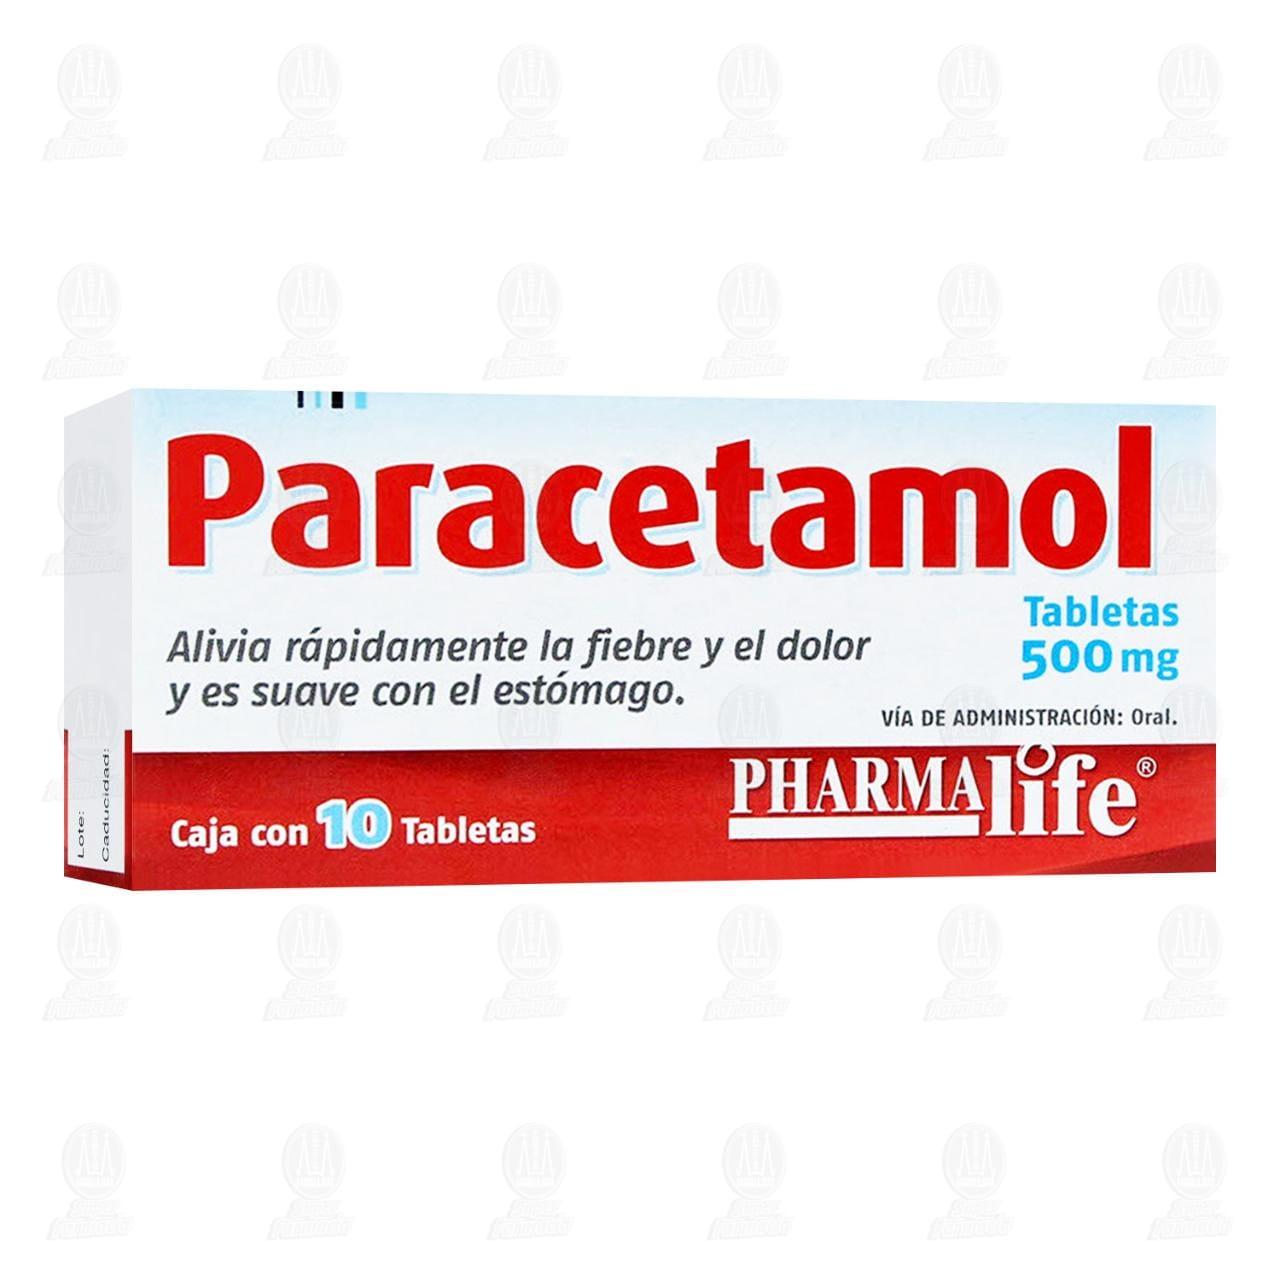 Comprar Paracetamol 500mg 10 Tabletas Pharmalife en Farmacias Guadalajara